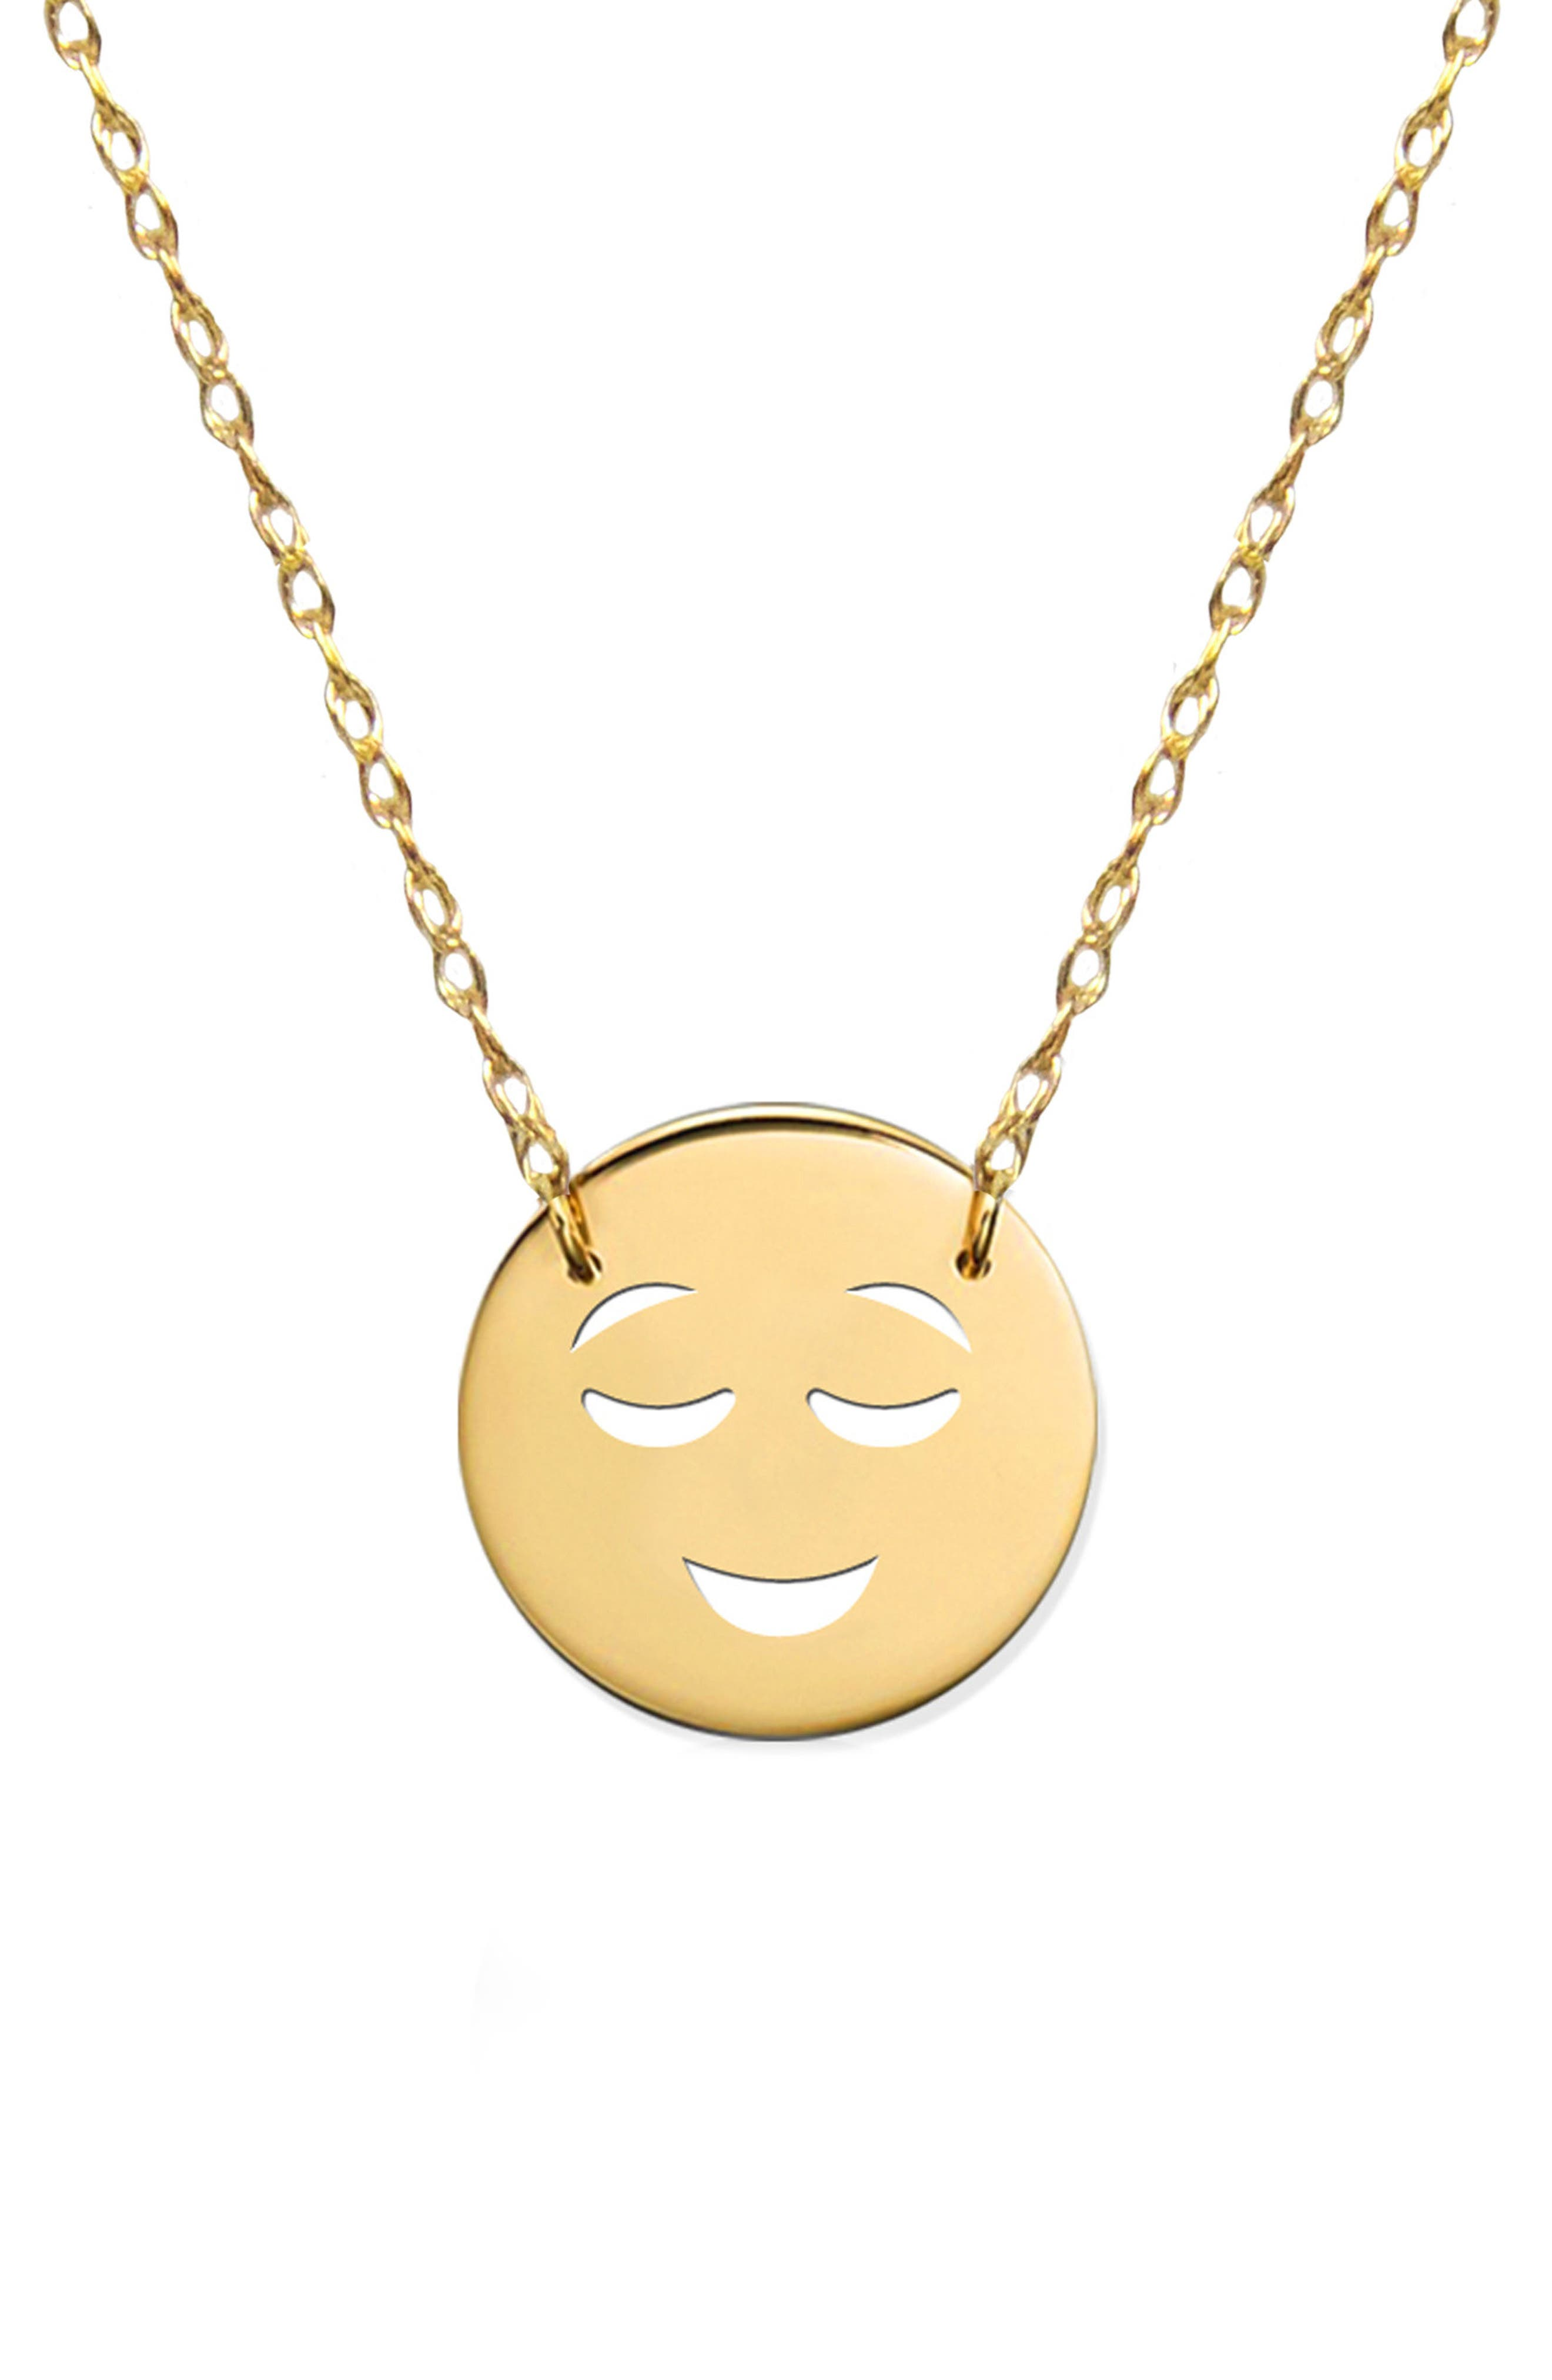 Happy Emoji Pendant Necklace,                             Main thumbnail 1, color,                             Yellow Gold